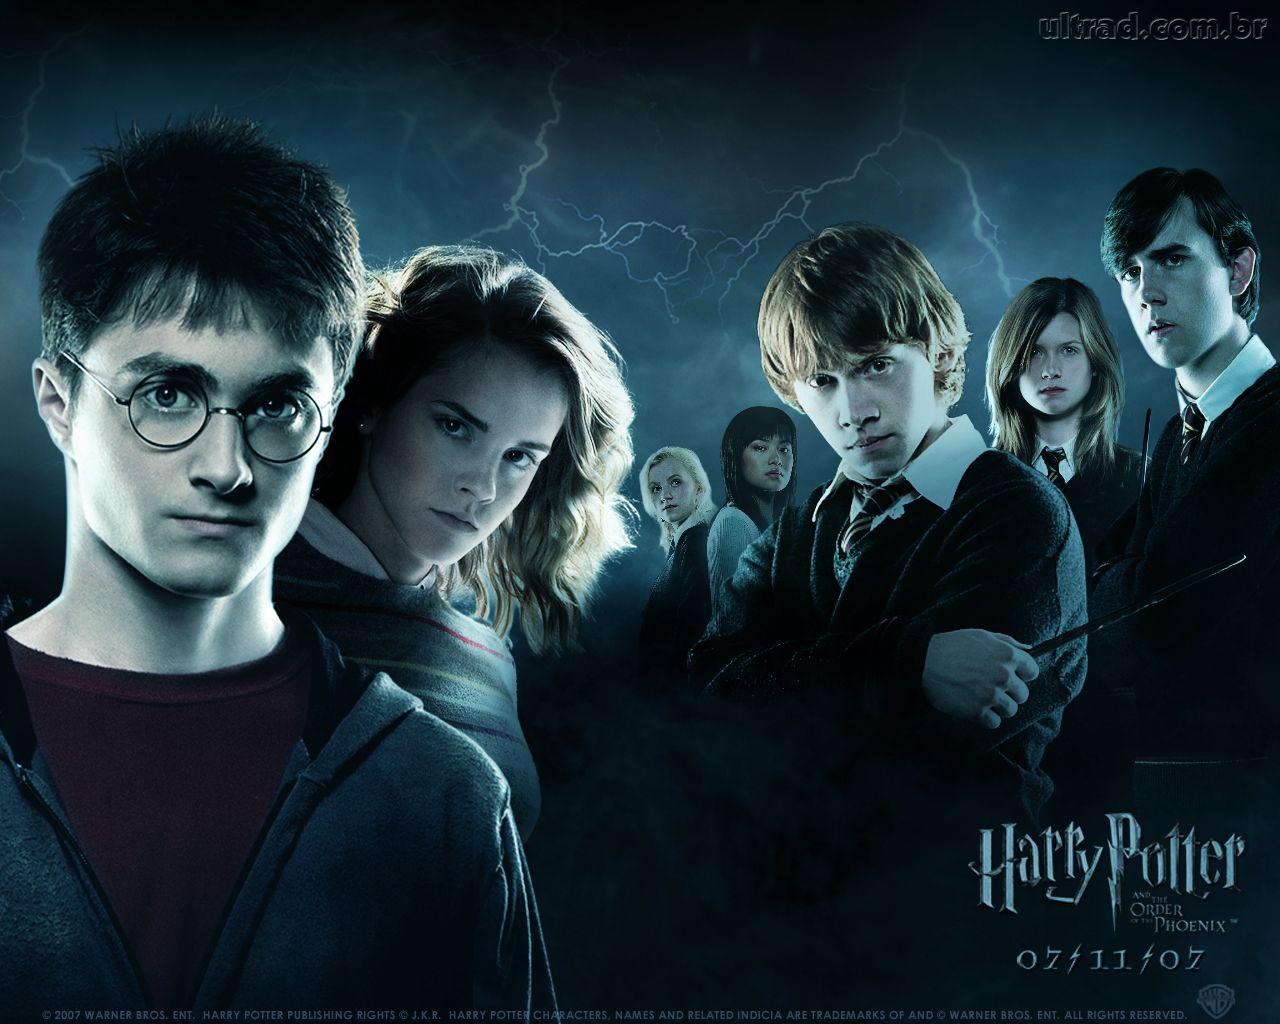 68186 Papel de Parede Harry Potter e a Ordem da Fenix Harry Potter and the Order of the Phoenix  68186 1280x1024 - #PotterWeek - Harry Potter e a Ordem da Fênix